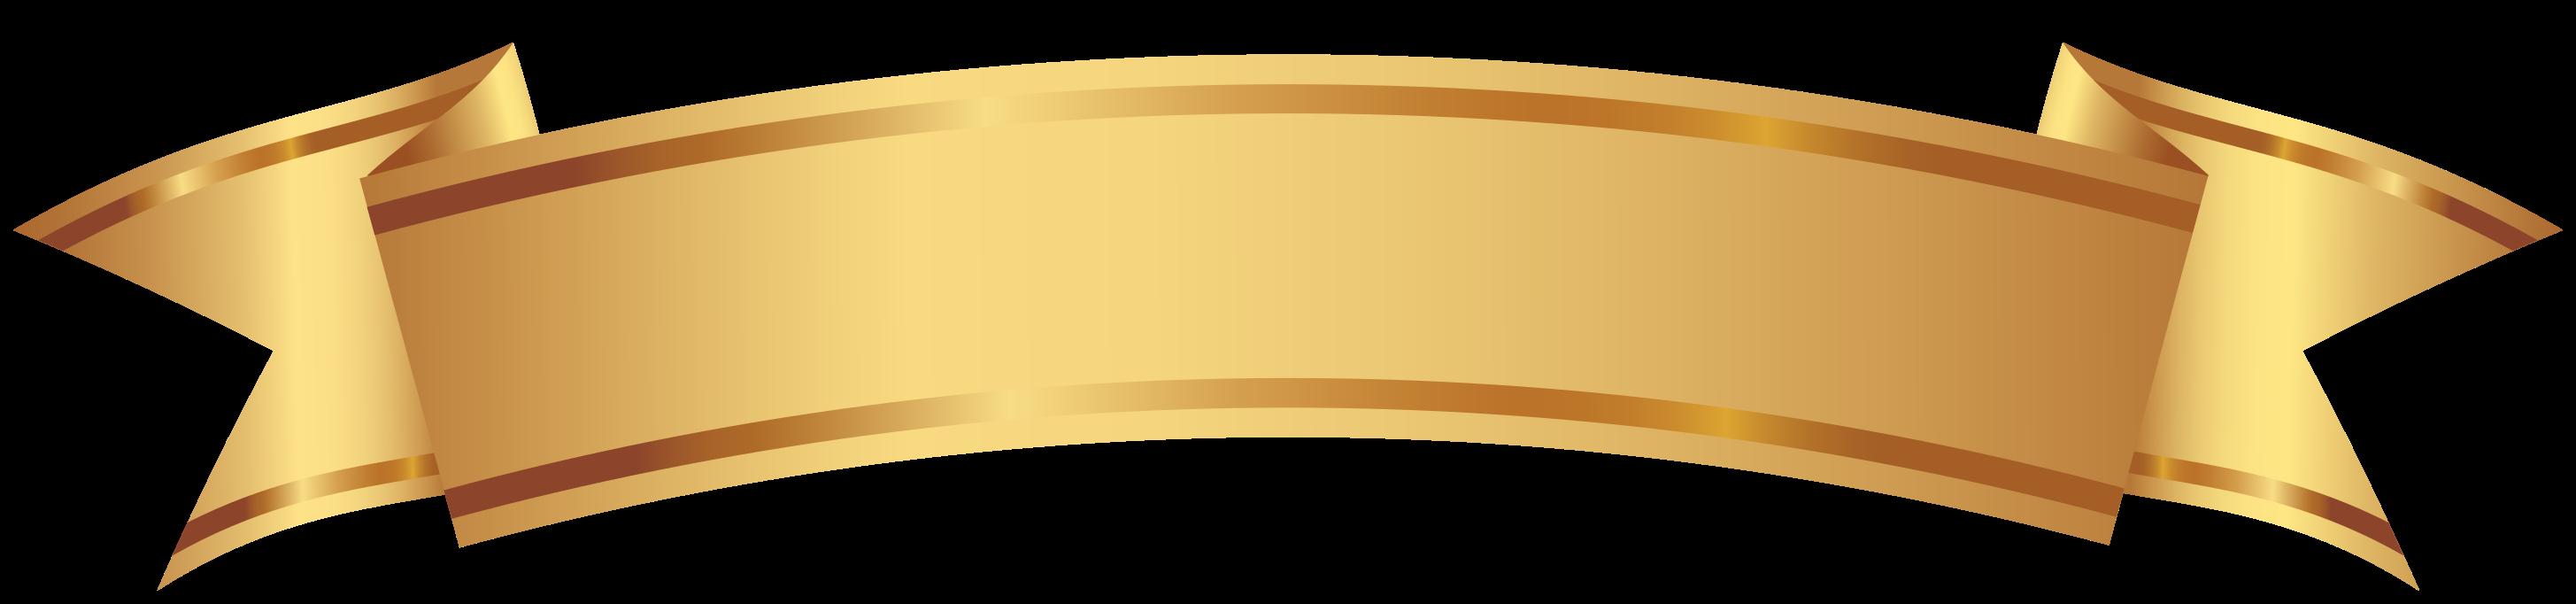 Golden decorative banner png